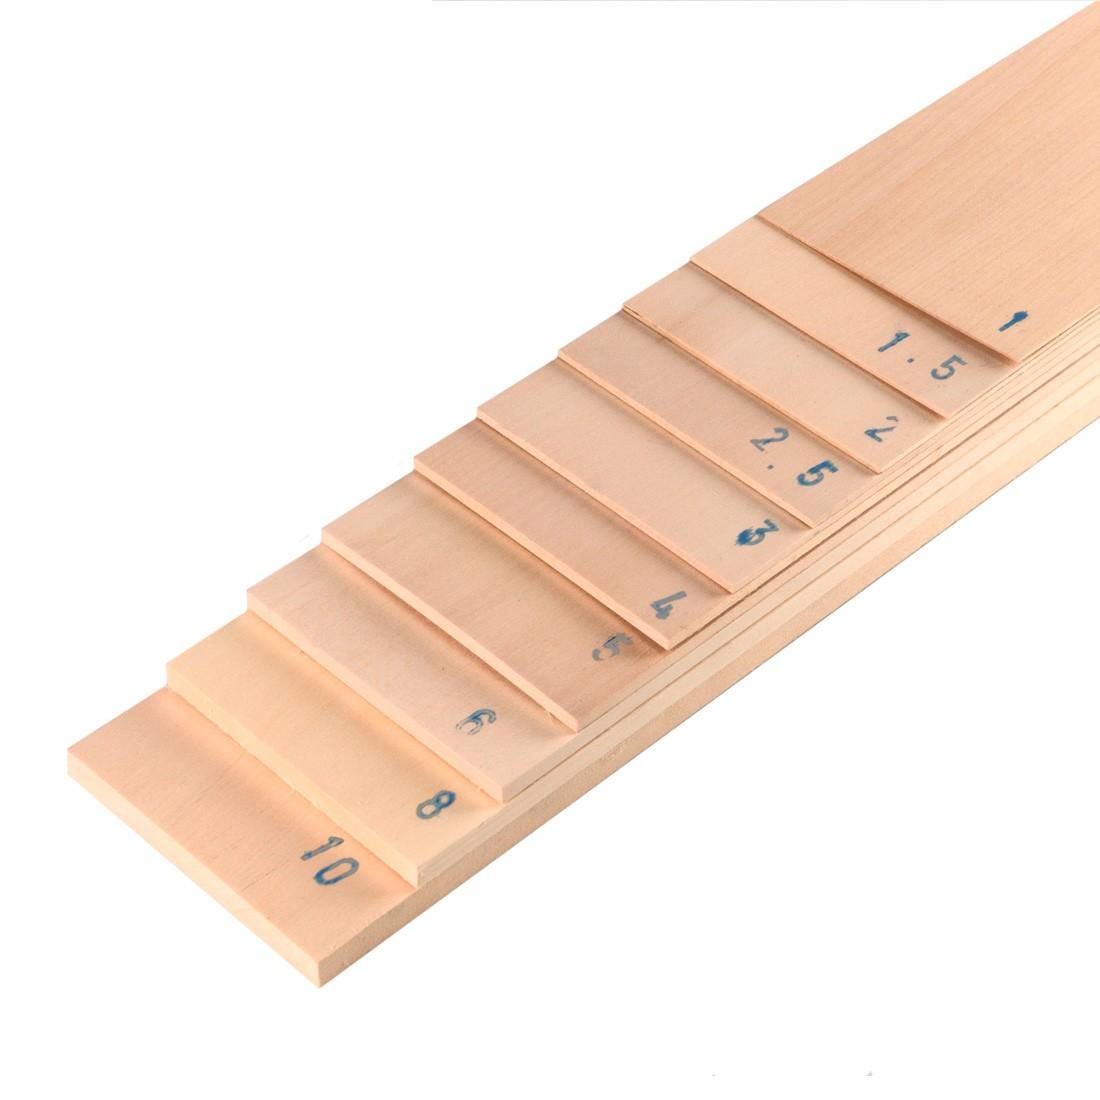 Planche tilleul mm.2,5x100x1000